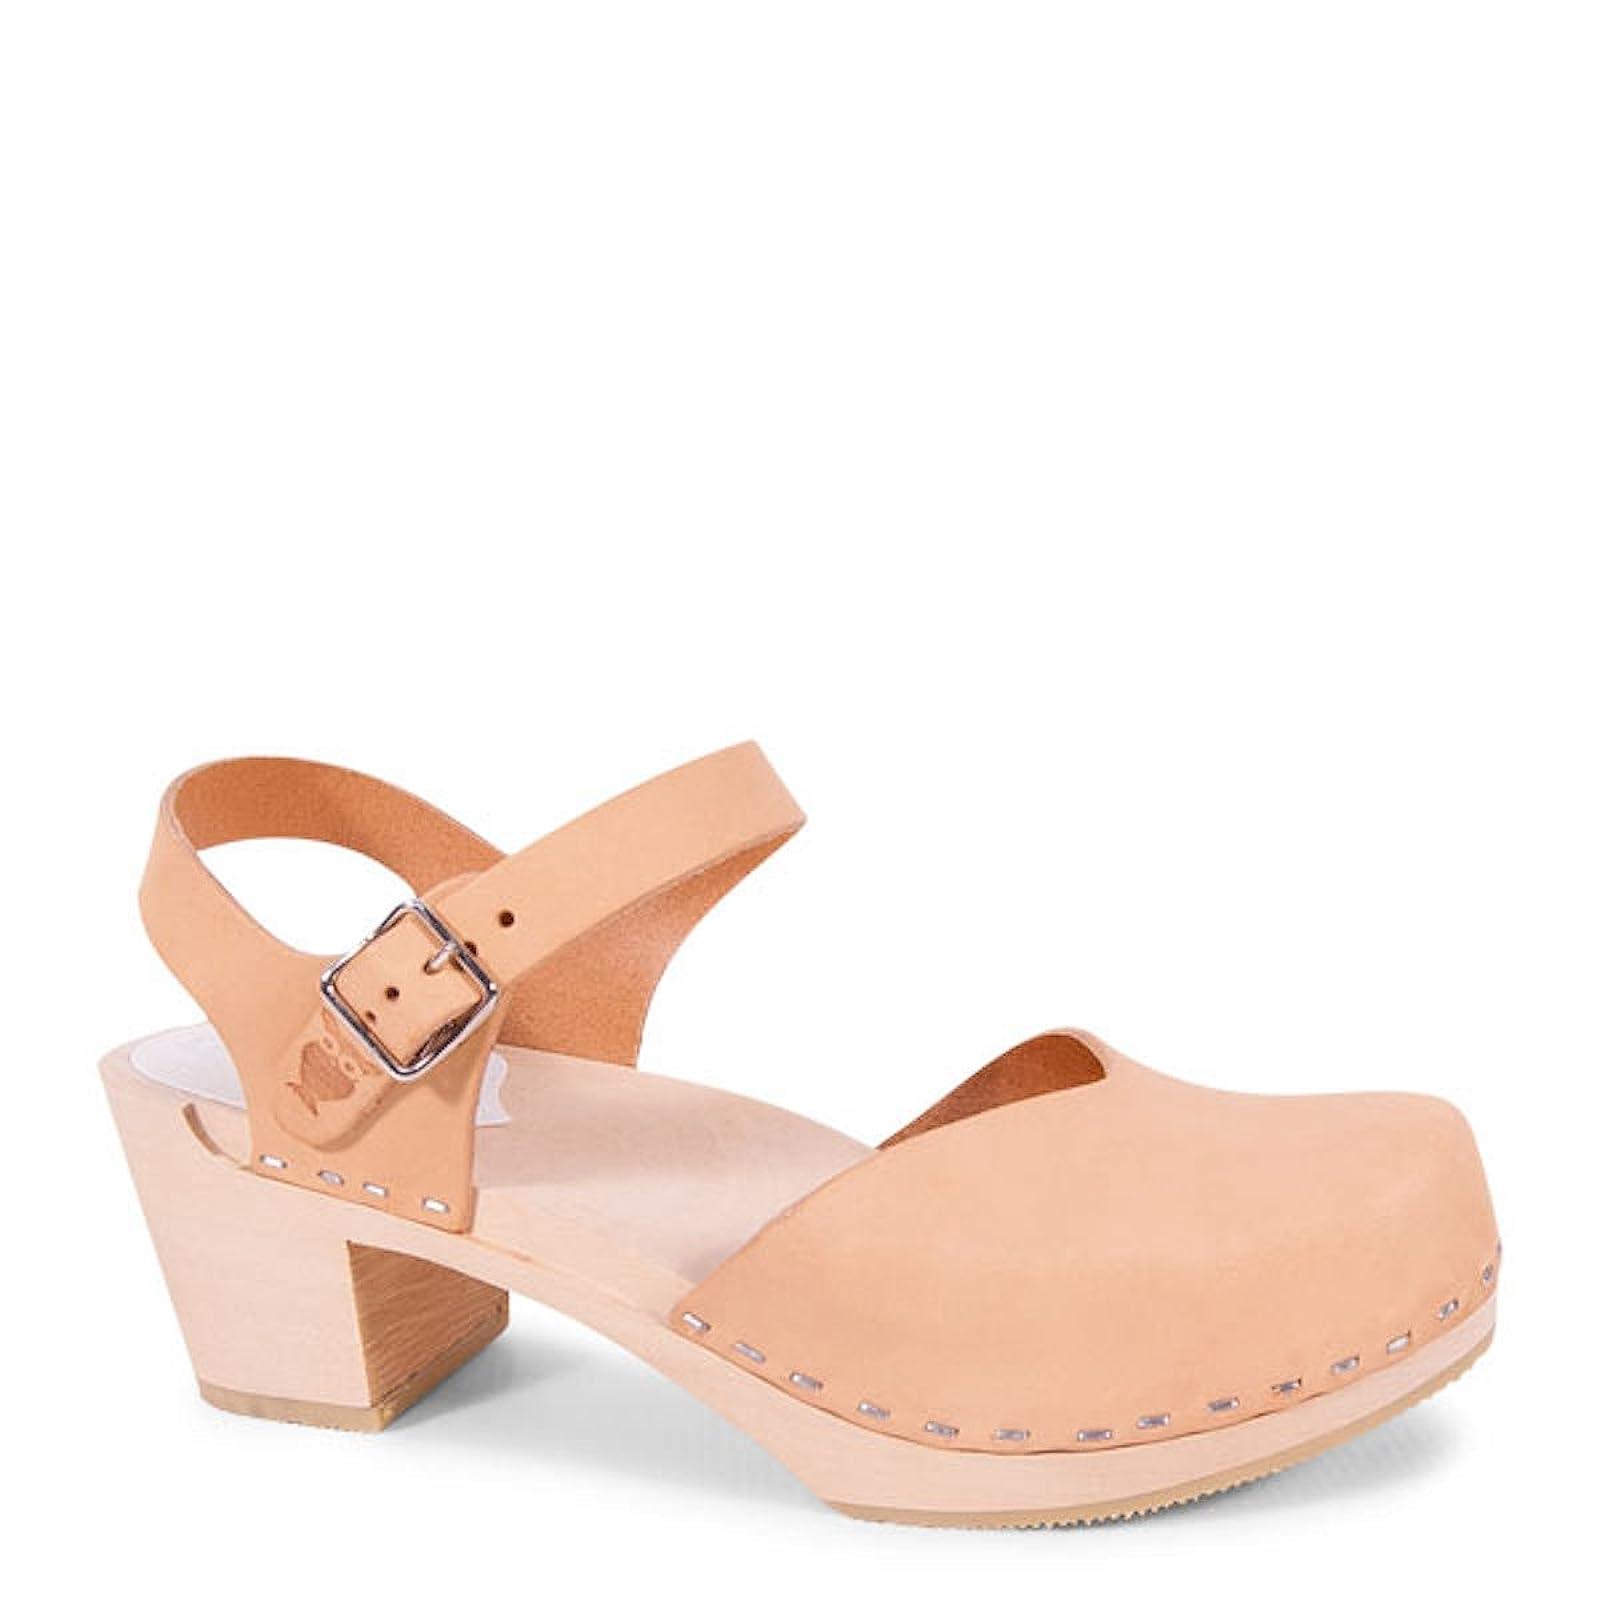 Sandgrens Swedish Wooden High Heel Clog Sandals - 1